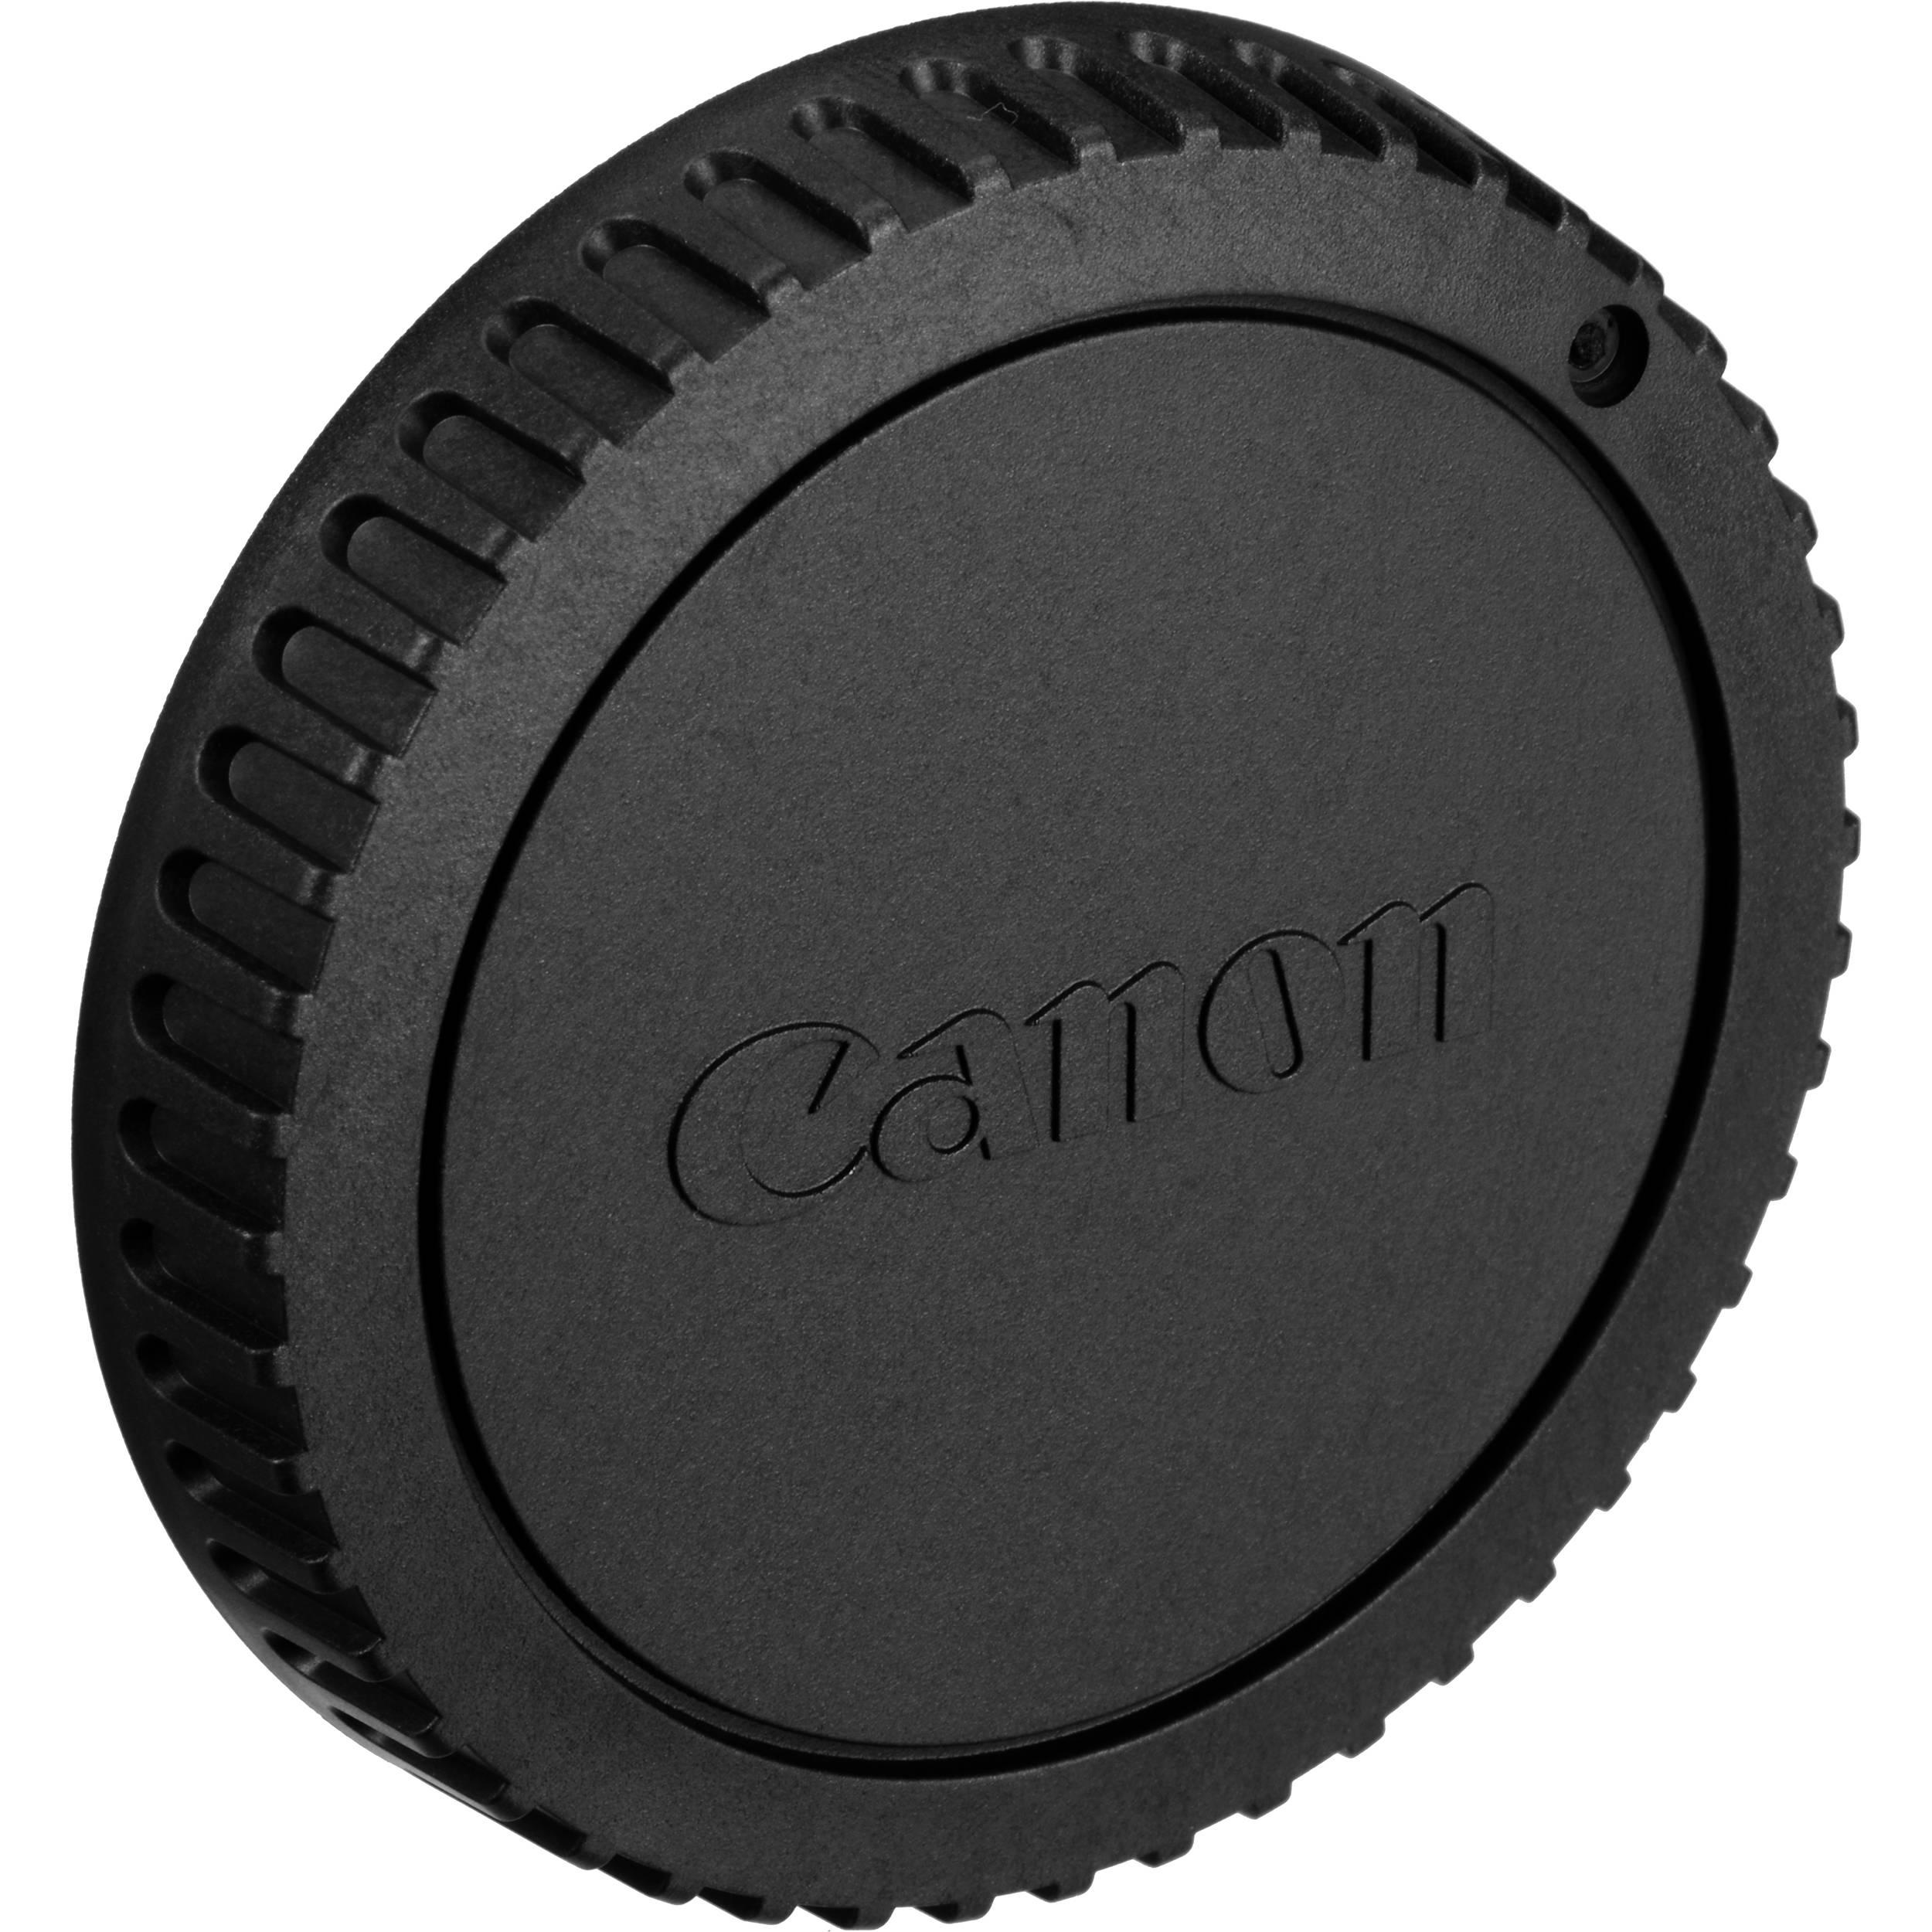 Canon Extender Cap E II 2724A001 B&H Photo Video